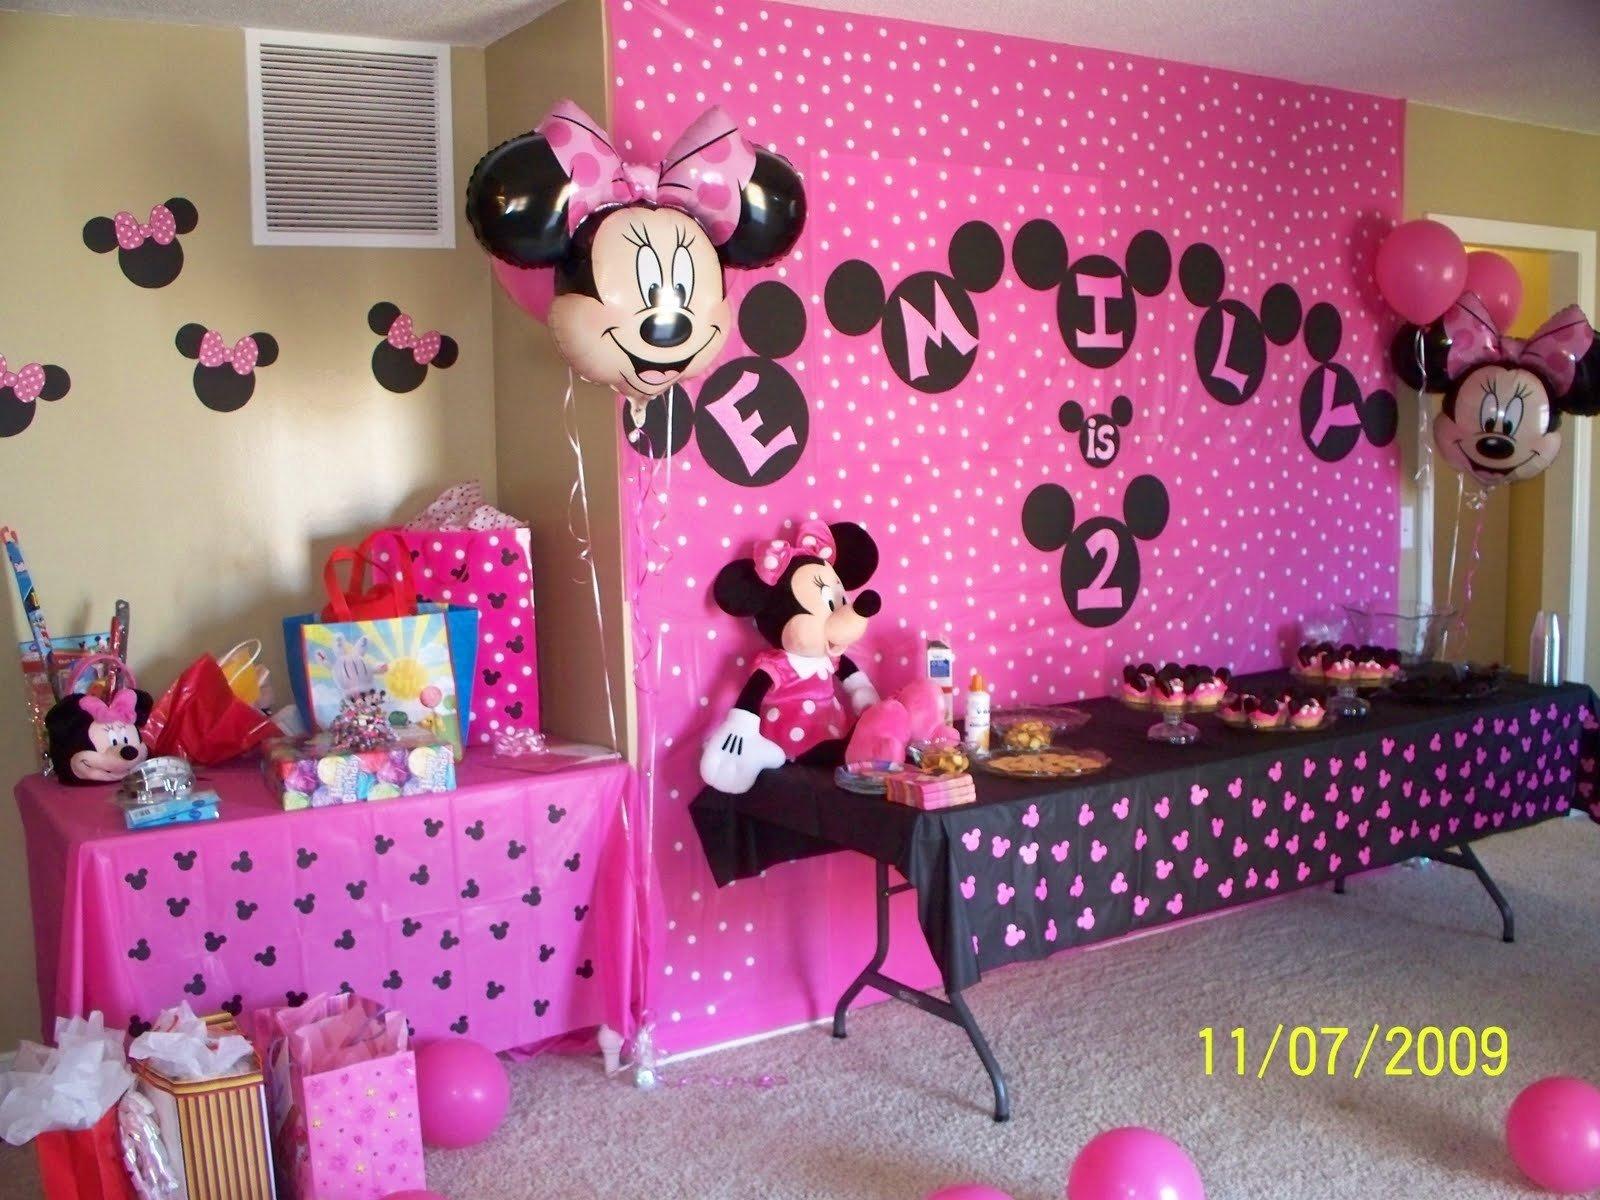 10 Fashionable Minnie Mouse First Birthday Ideas themes birthday minnie mouse party ideas for first birthday 5 2021